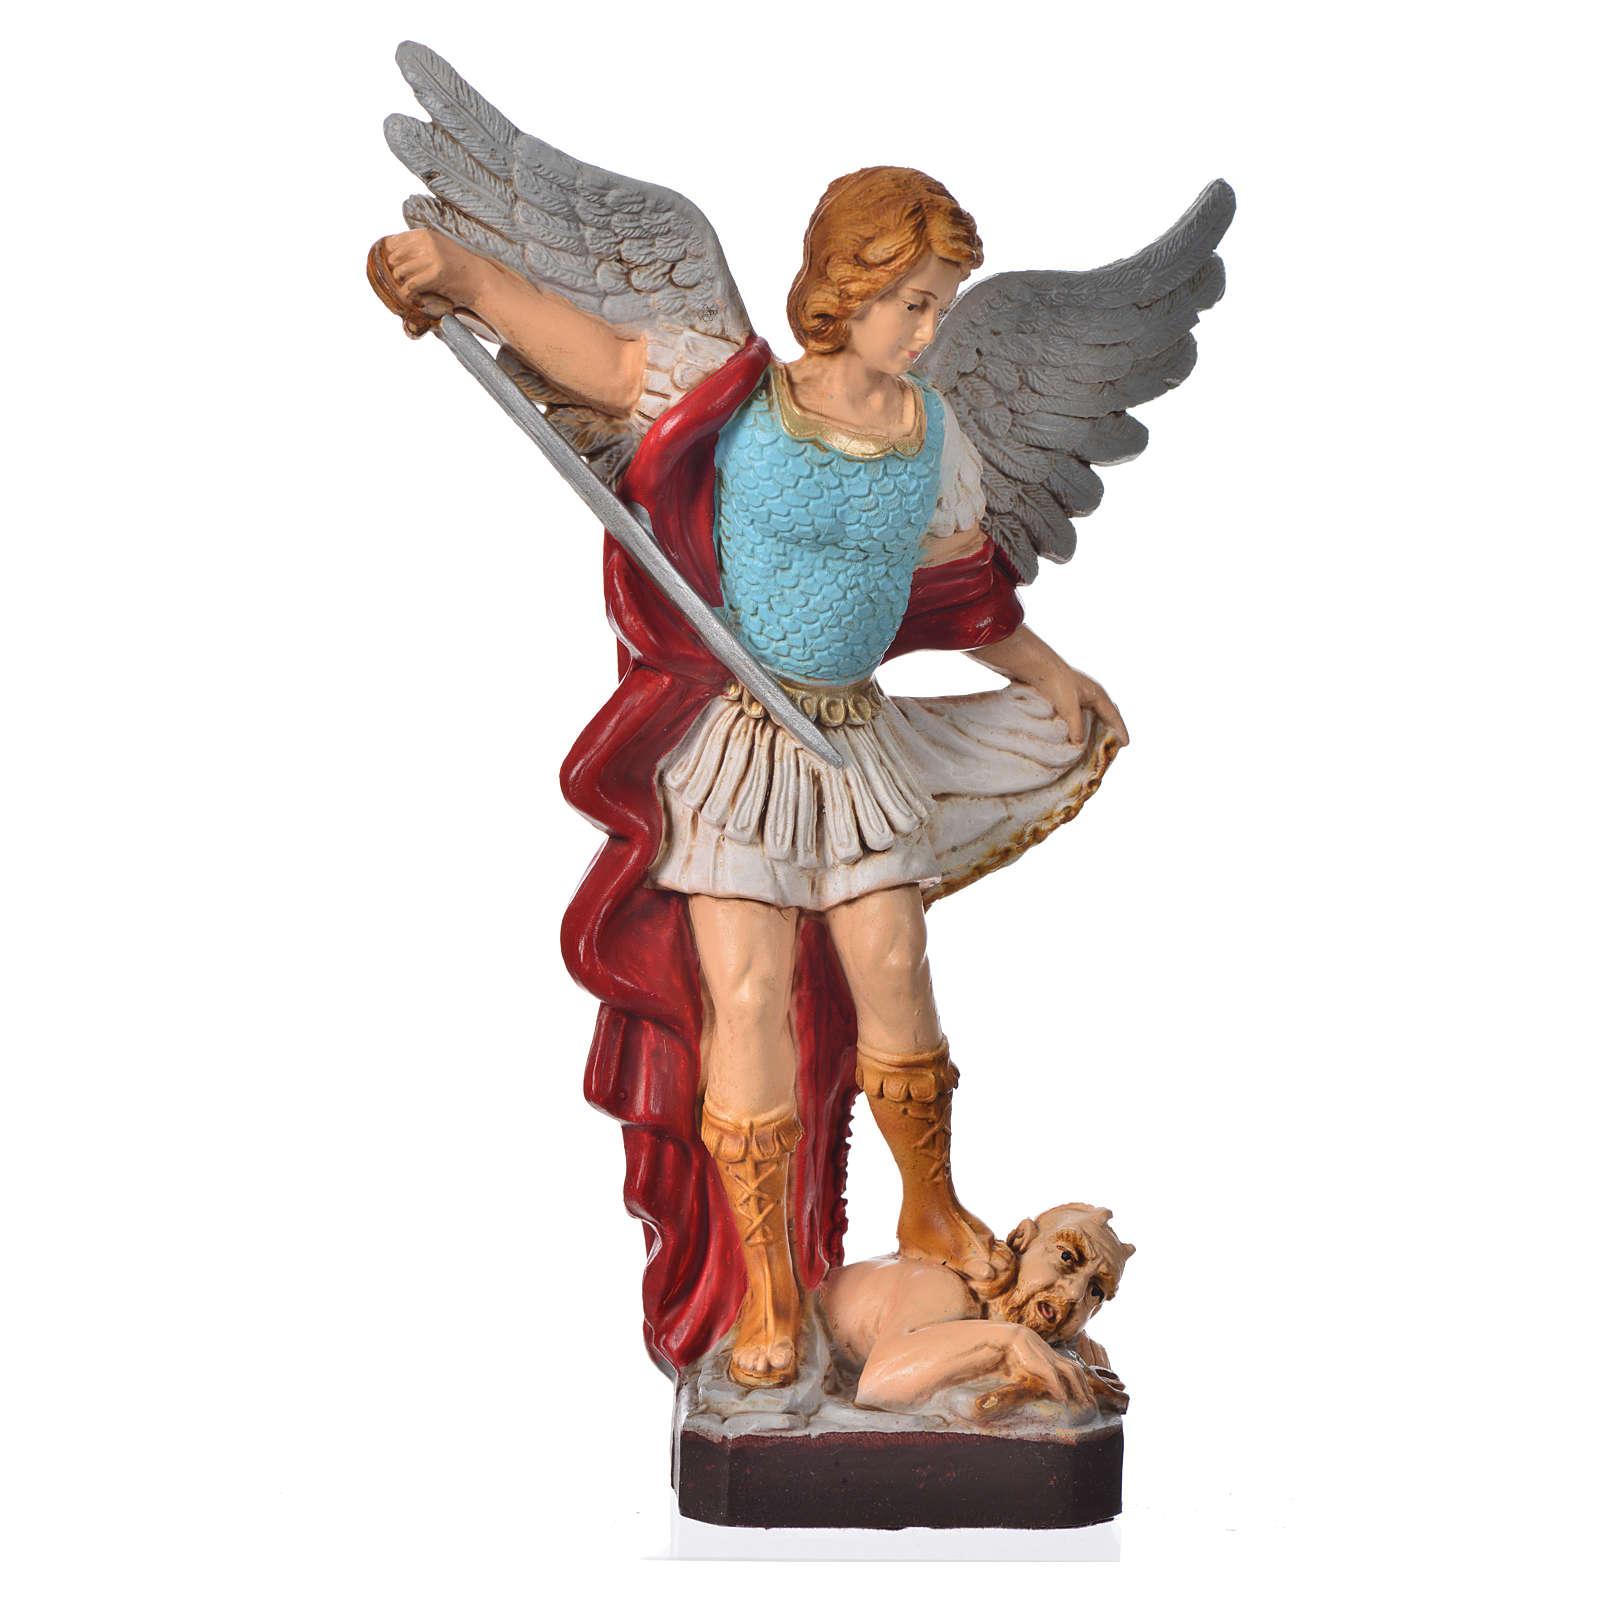 Michael archangel statue 16cm, unbreakable material 4